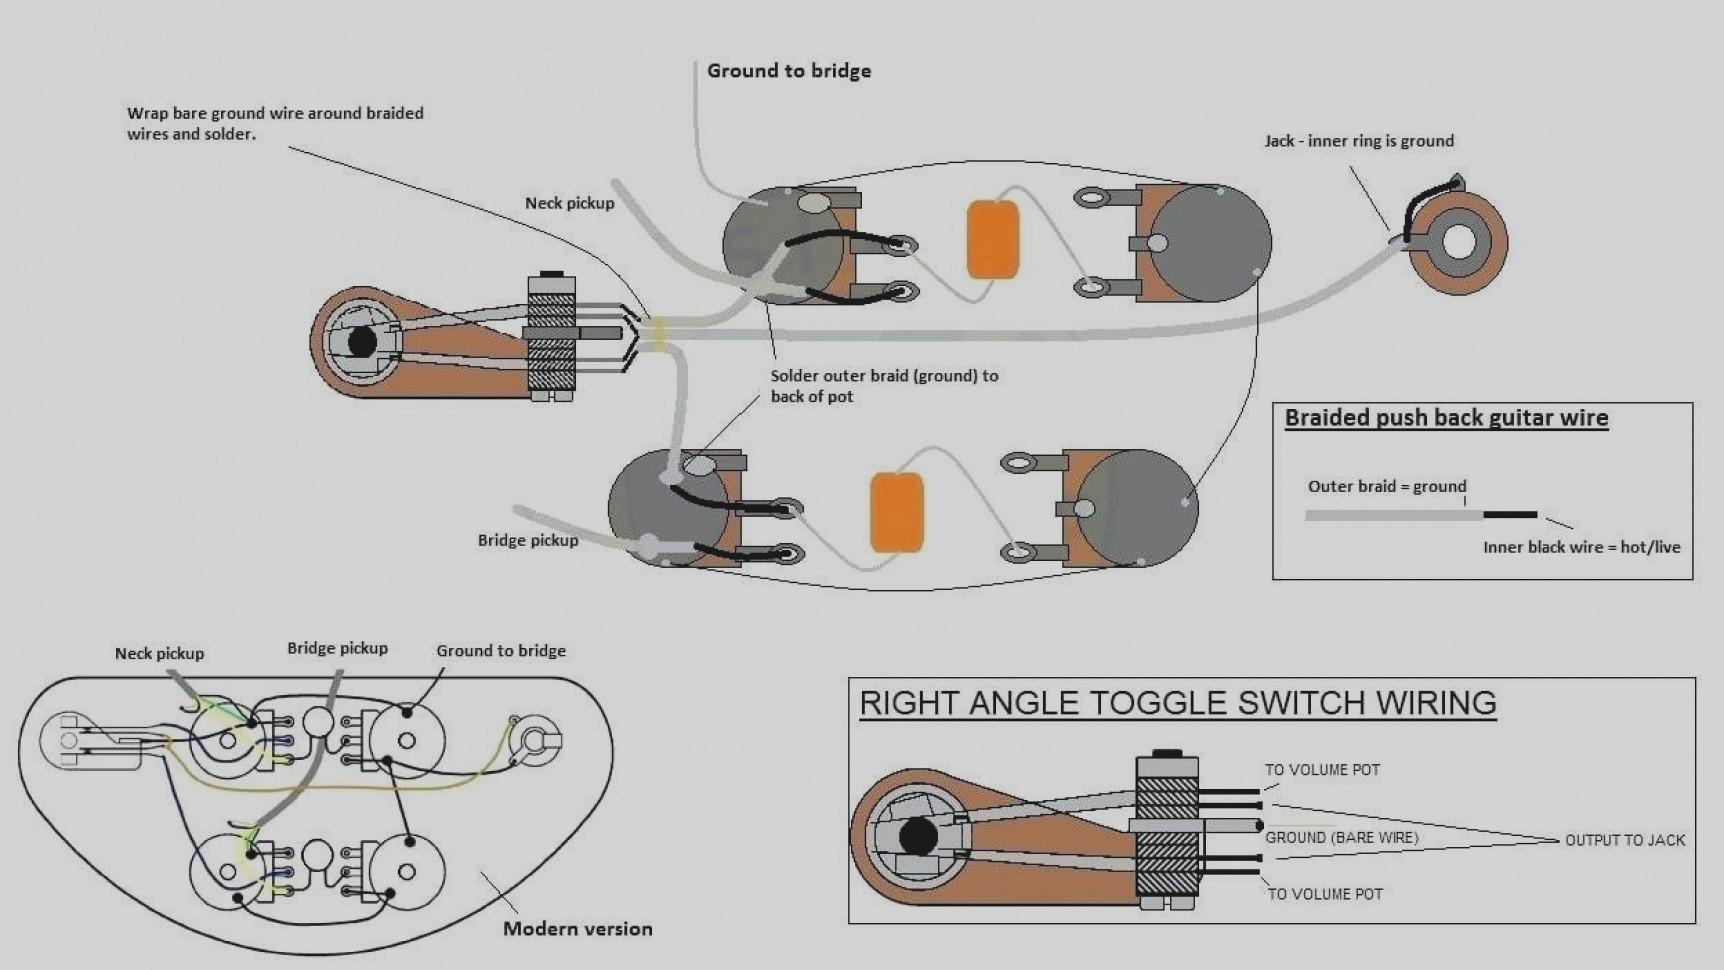 gallery of gibson es 335 wiring diagram britishpanto house wiring rh  housewiringdiagrams me Gibson ES 335